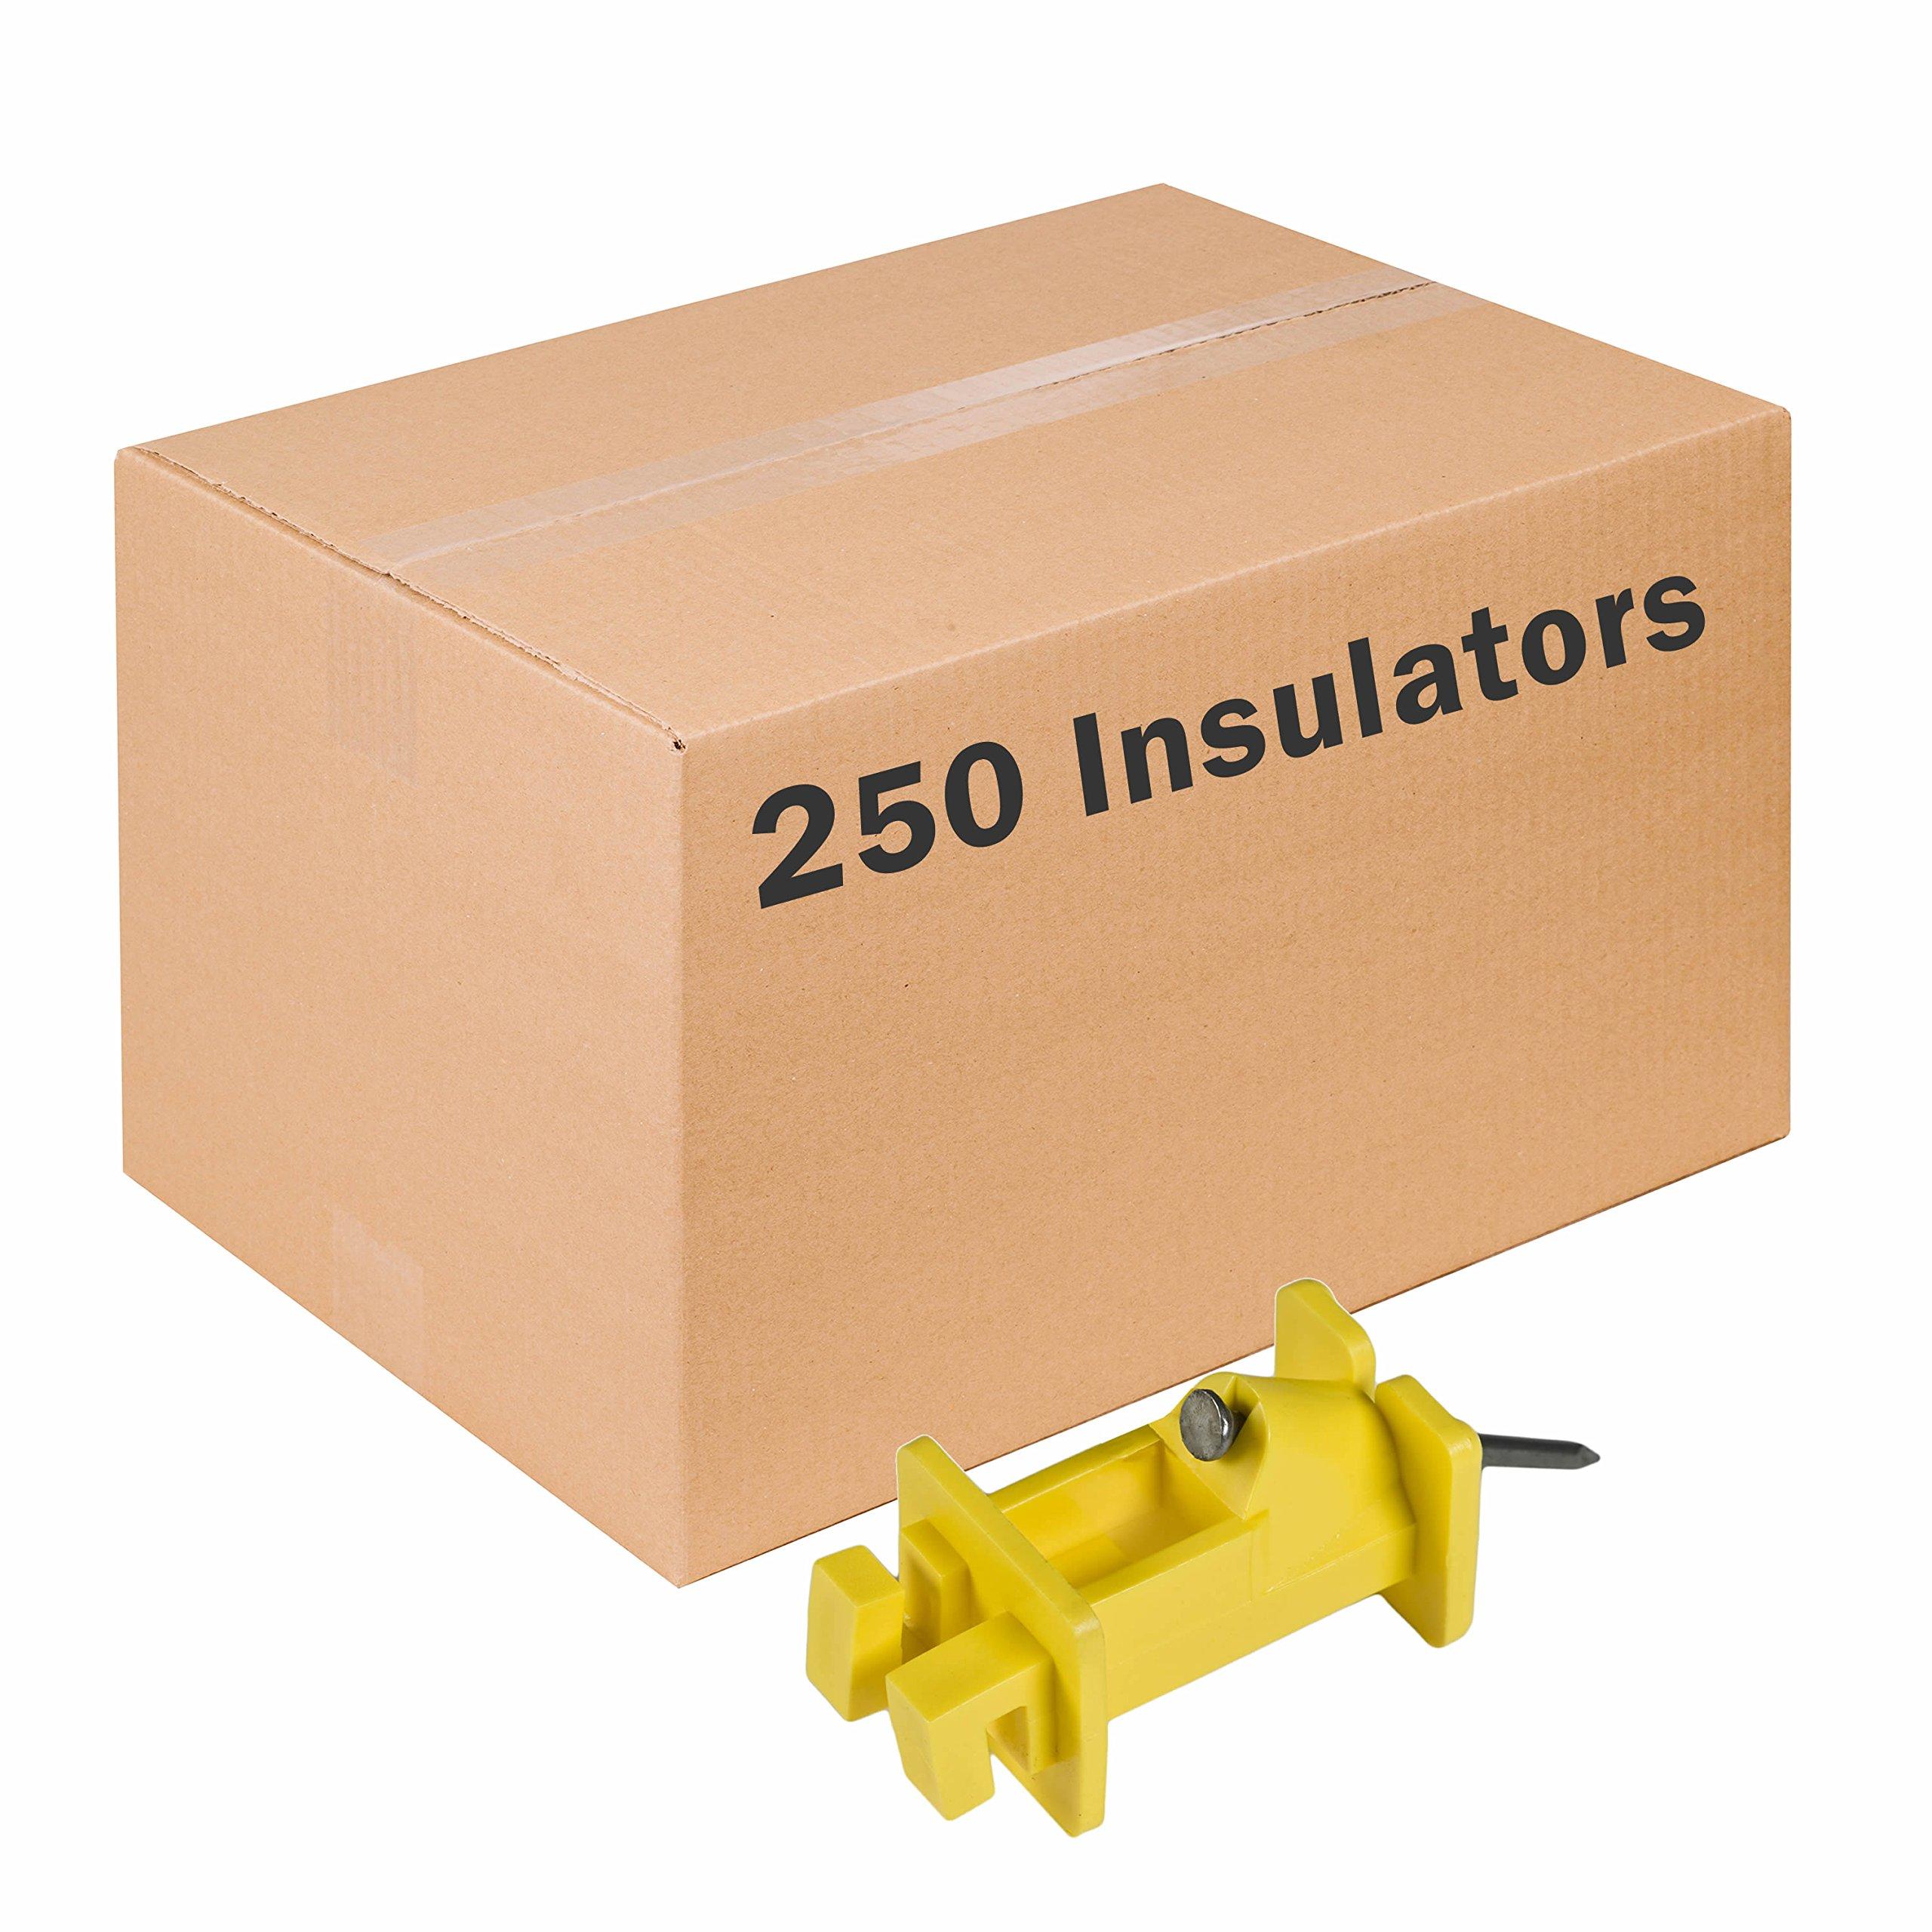 Zareba IWNY-Z Yellow Slant Nail Insulator - 250 Pack by Safer Brand